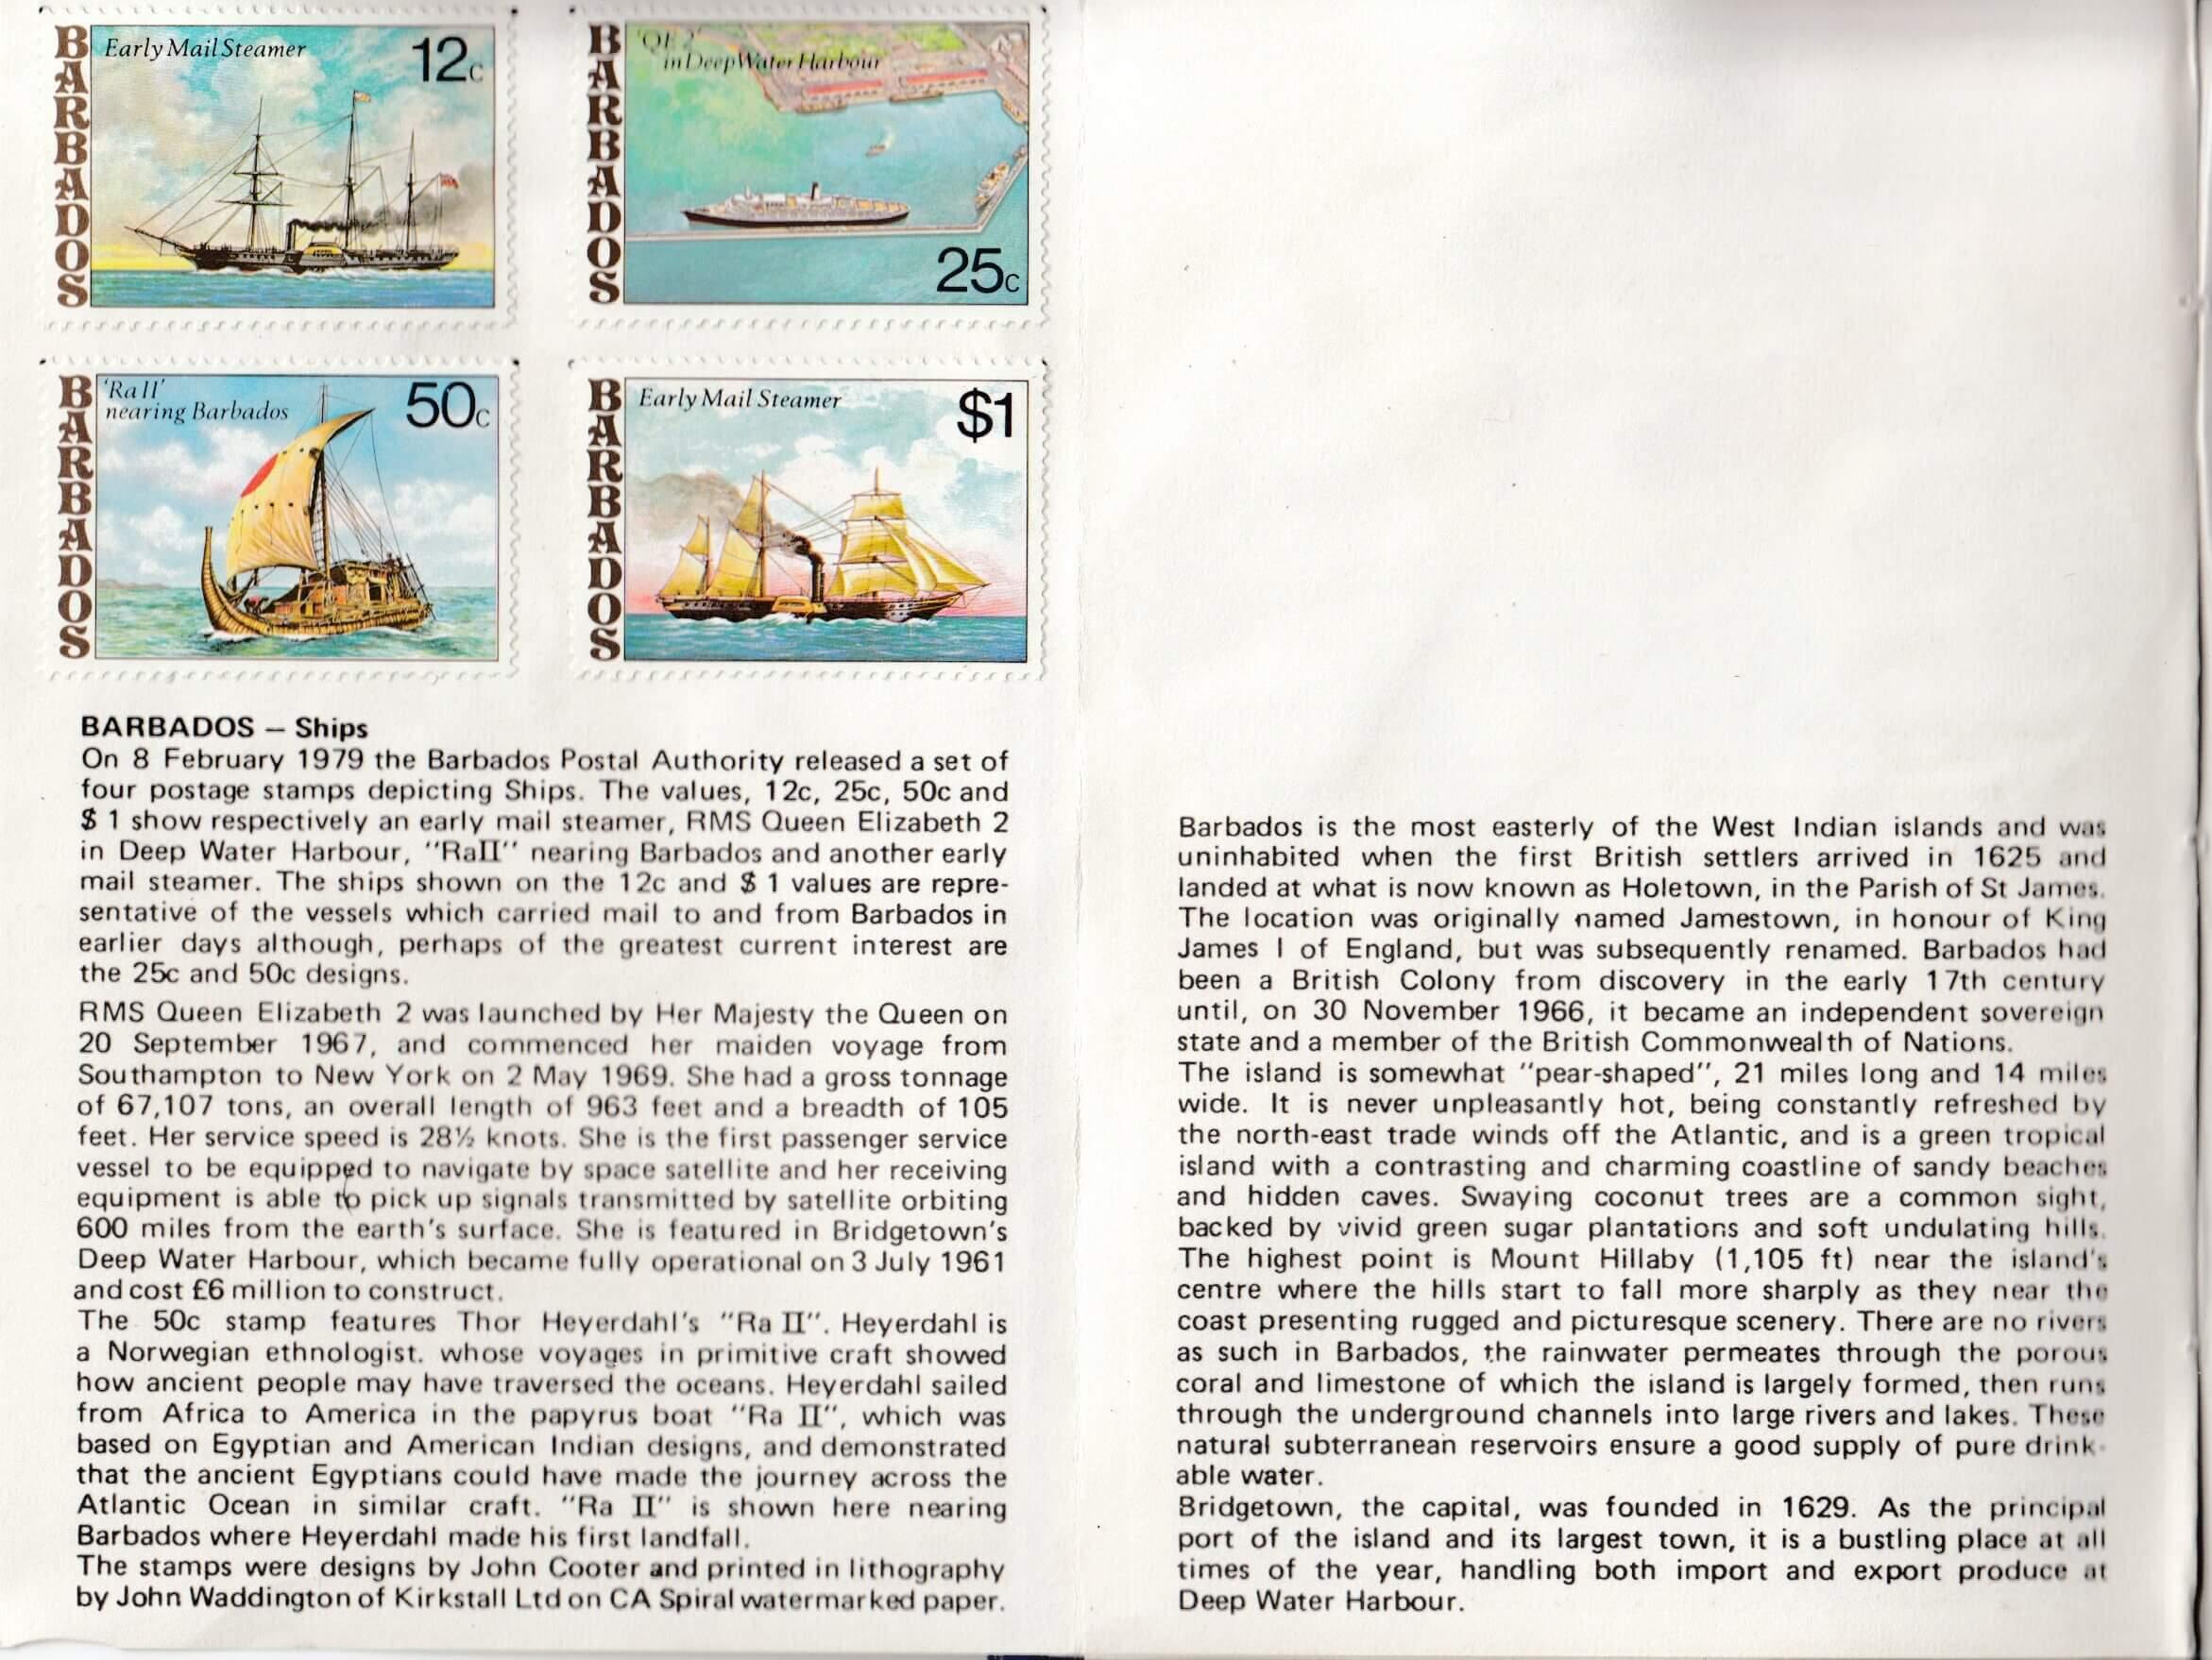 XVIIIth Congress of the Universal Postal Union, Rio de Janeiro 1979 - Barbados stamp booklet page 3